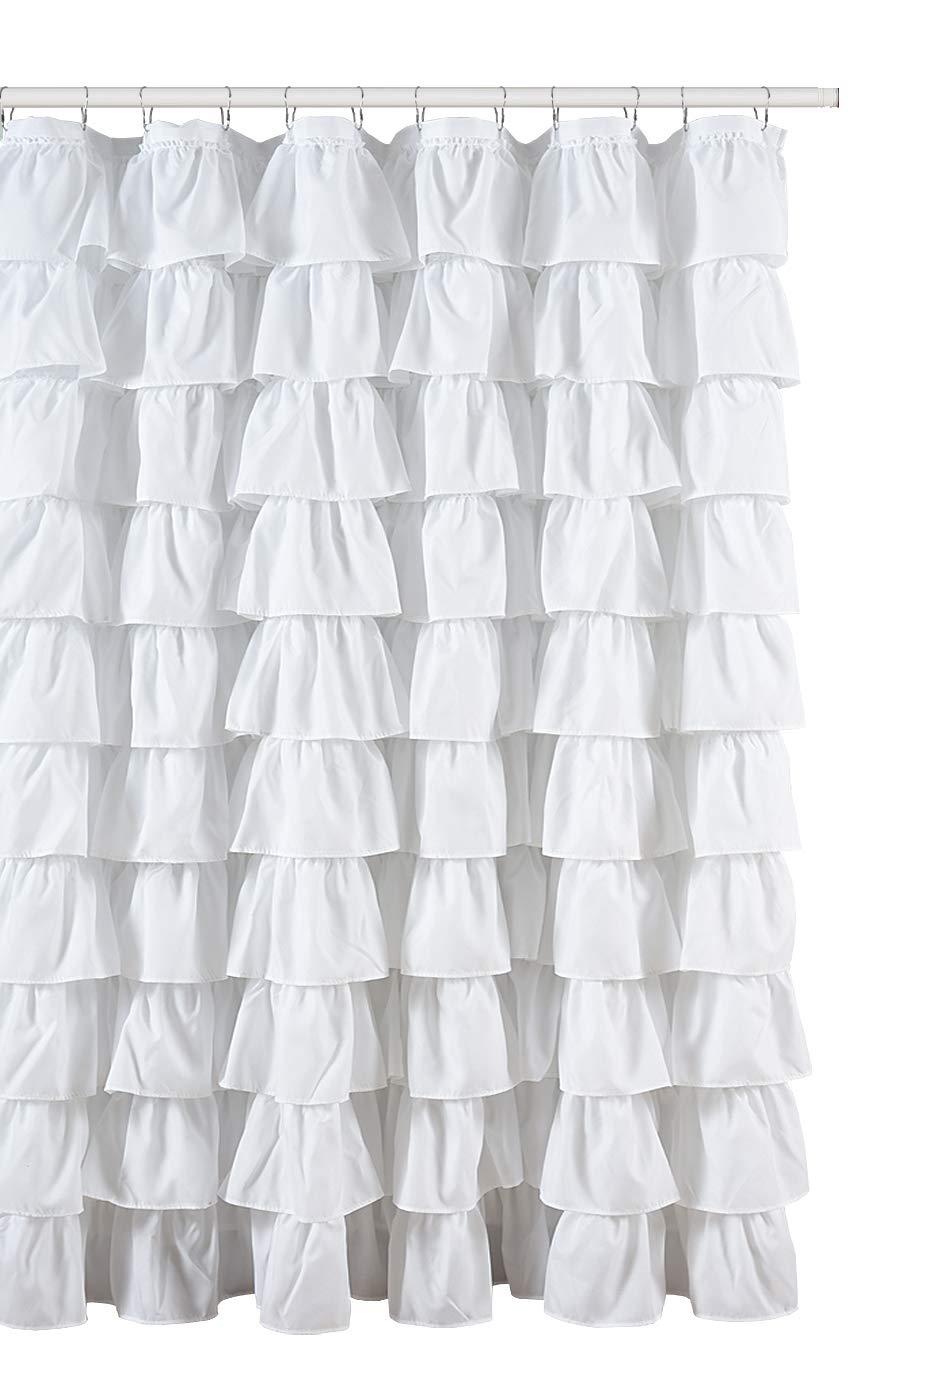 Amazon.com: Ruffled White Fabric Shower Curtain: Home & Kitchen